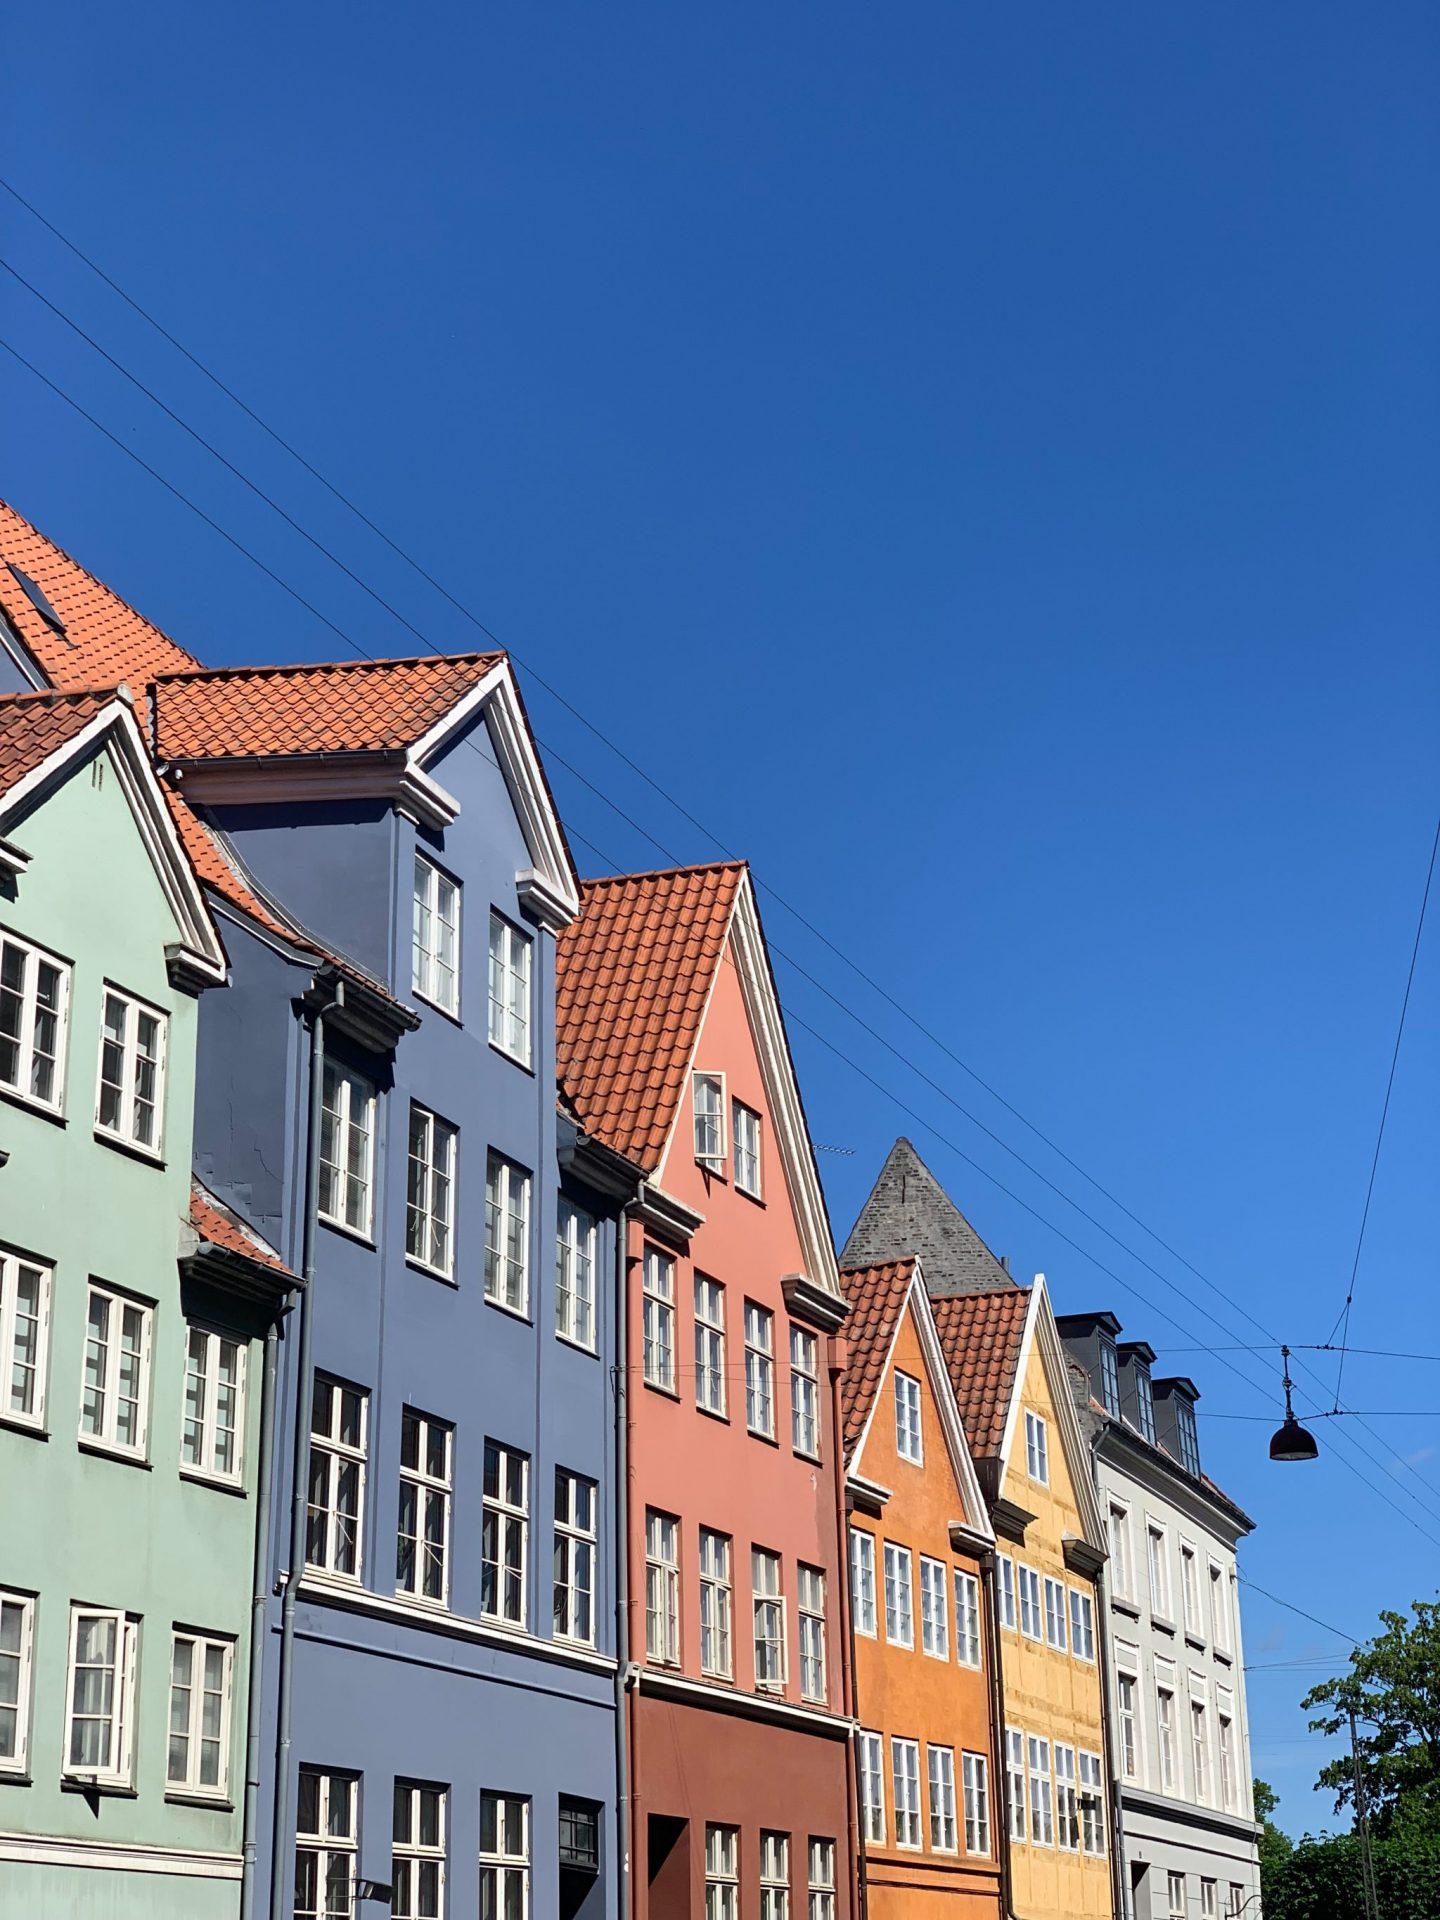 Copenhagen's 3 days of design event, Blue skies, Hello Peagreen